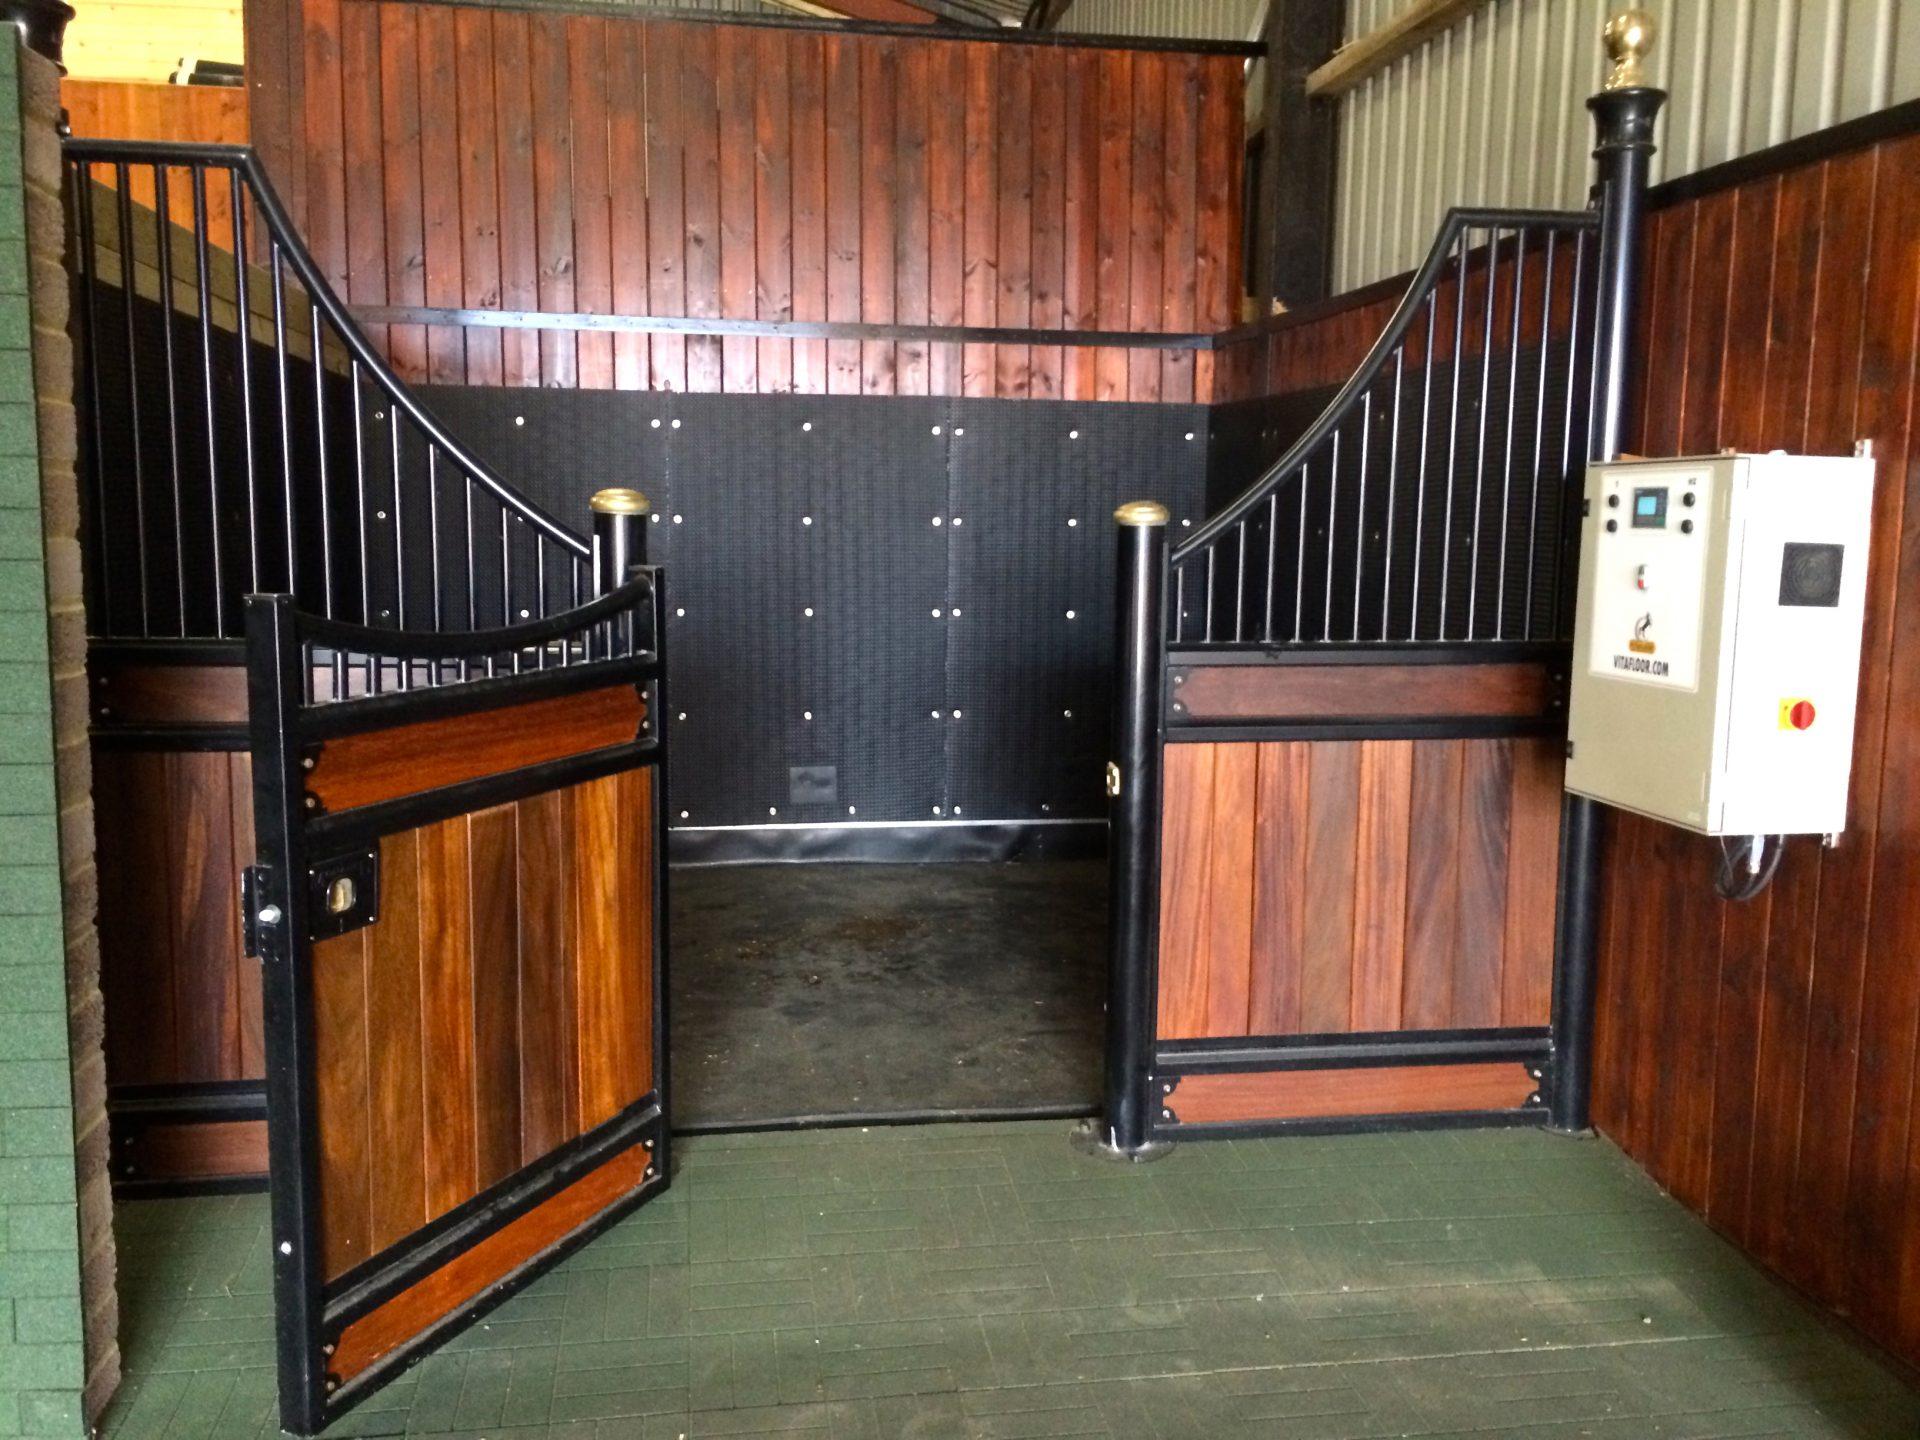 equine vibration therapy system horse vibrating platform